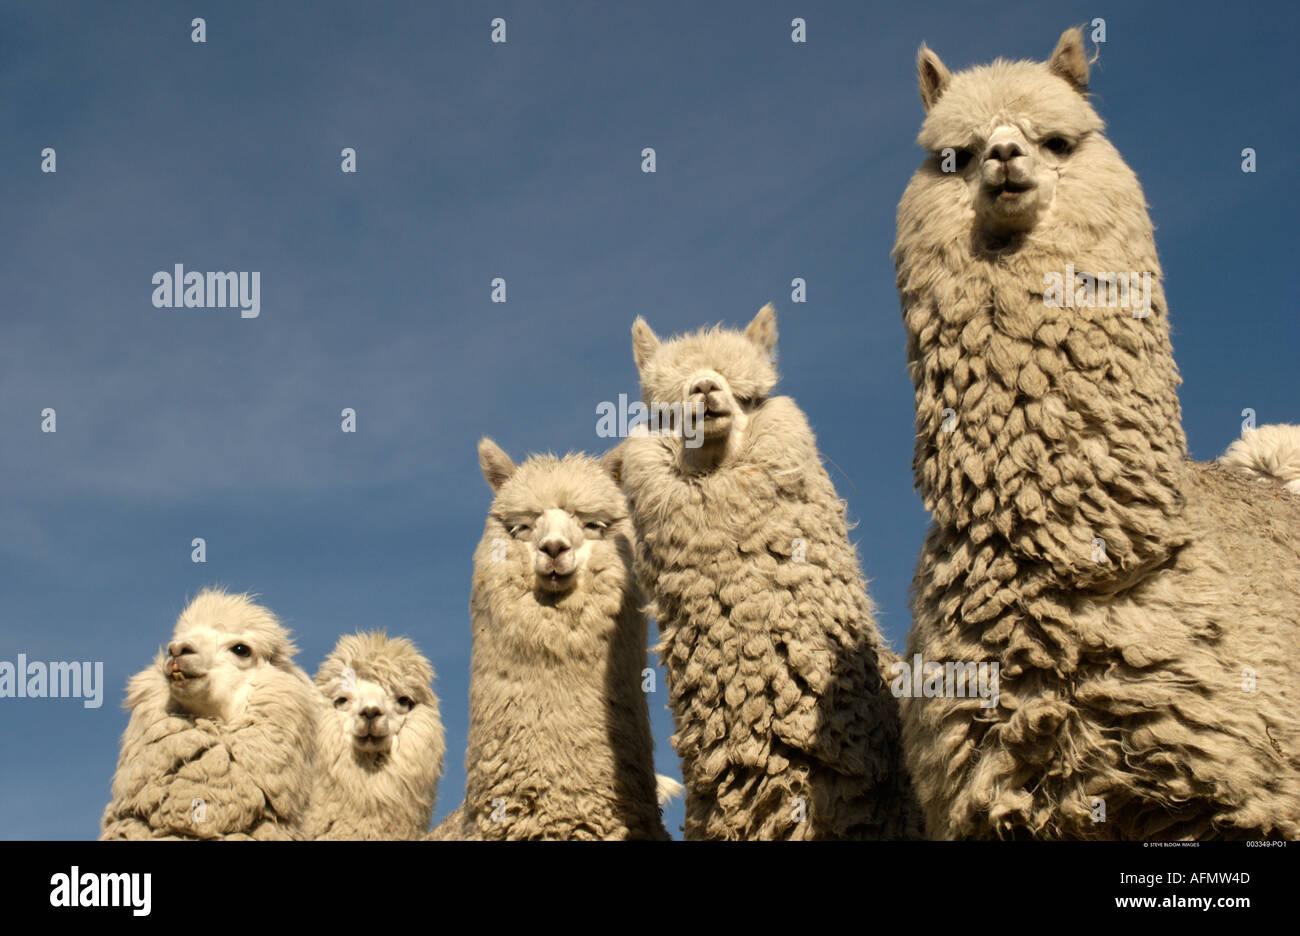 Alpacas base of Cotopaxi Volcano Andes Ecuador South America - Stock Image